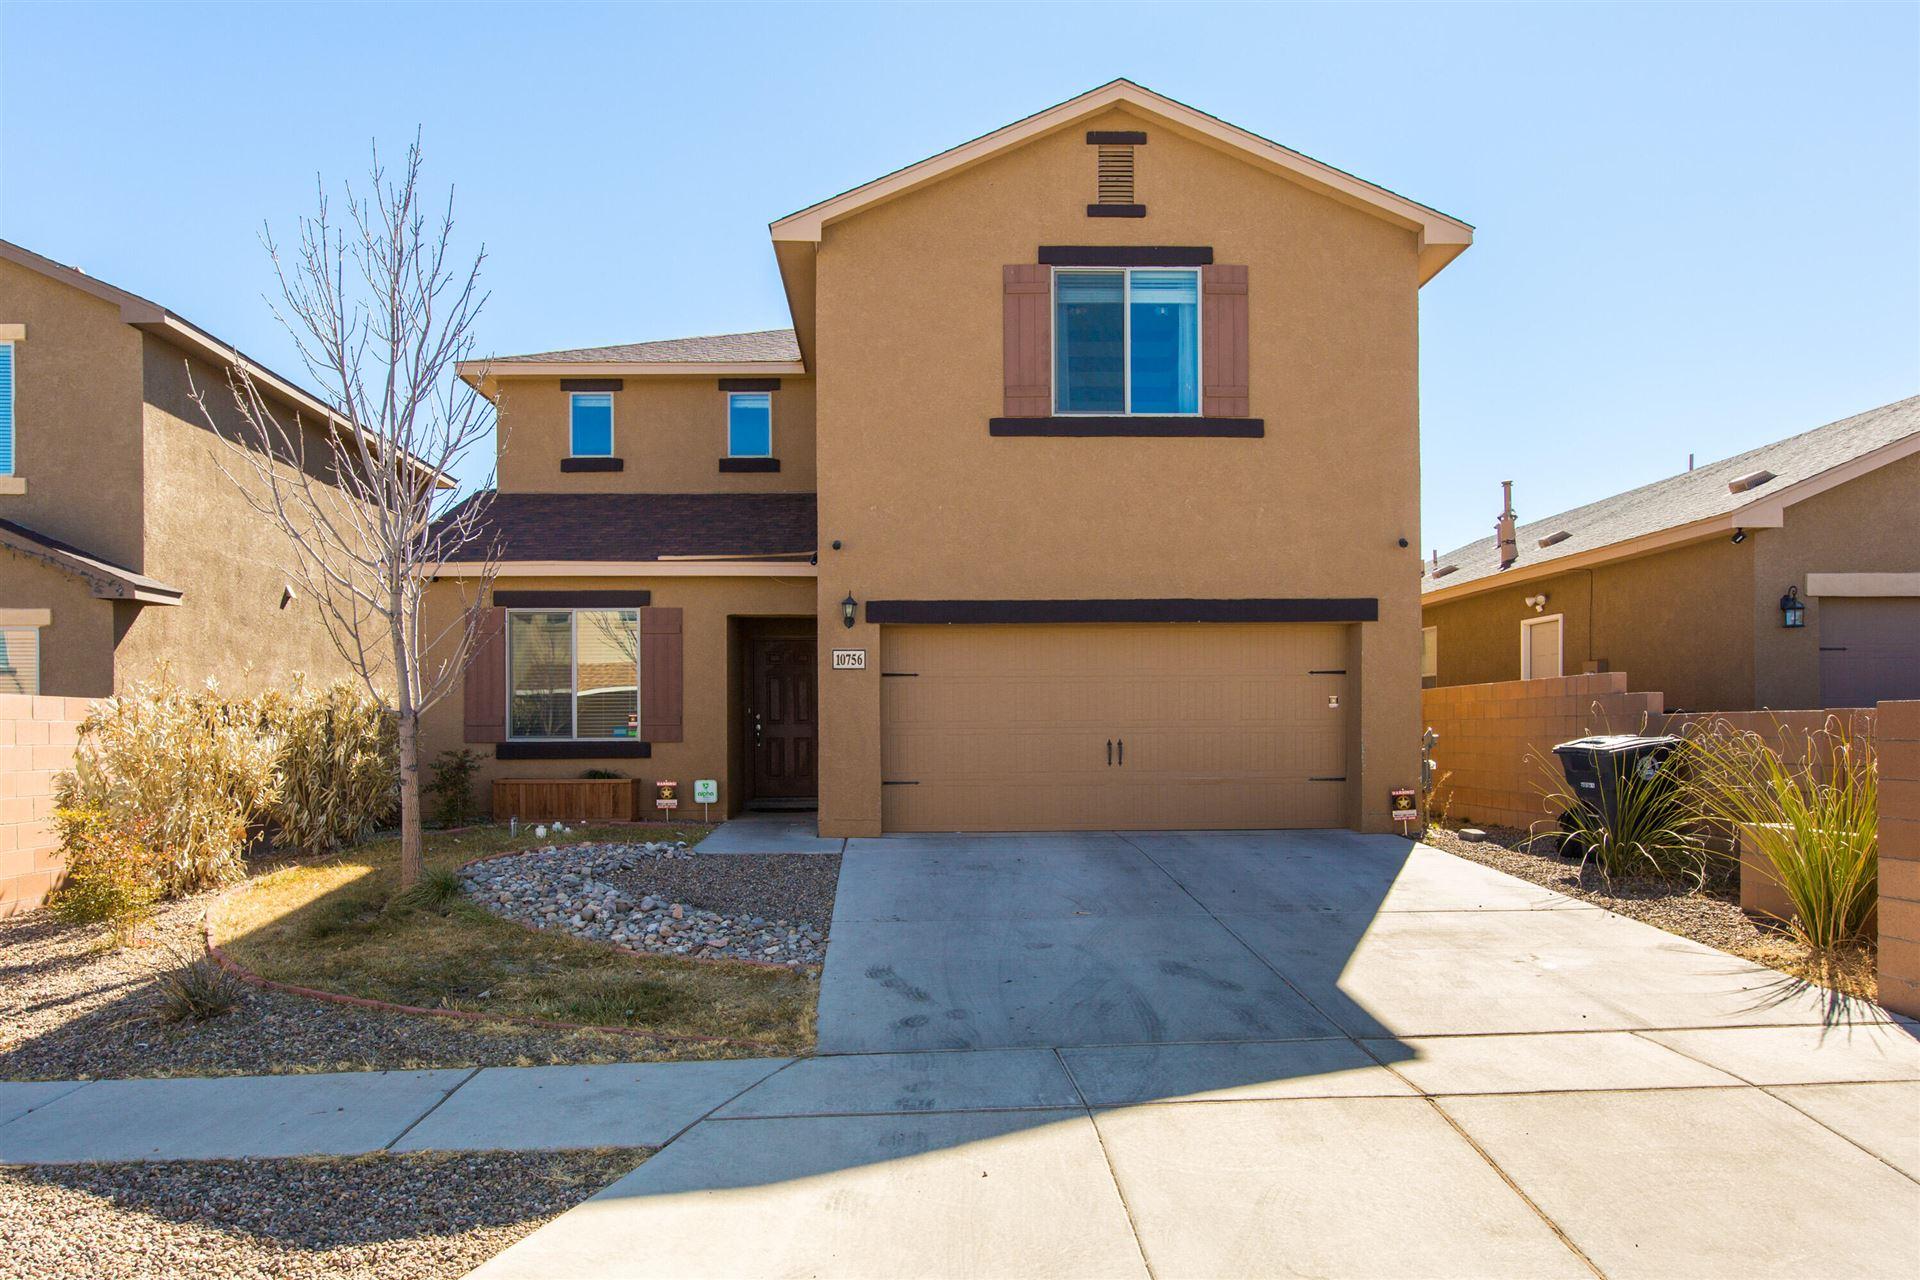 10756 CORONA RANCH Road SW, Albuquerque, NM 87121 - MLS#: 985736